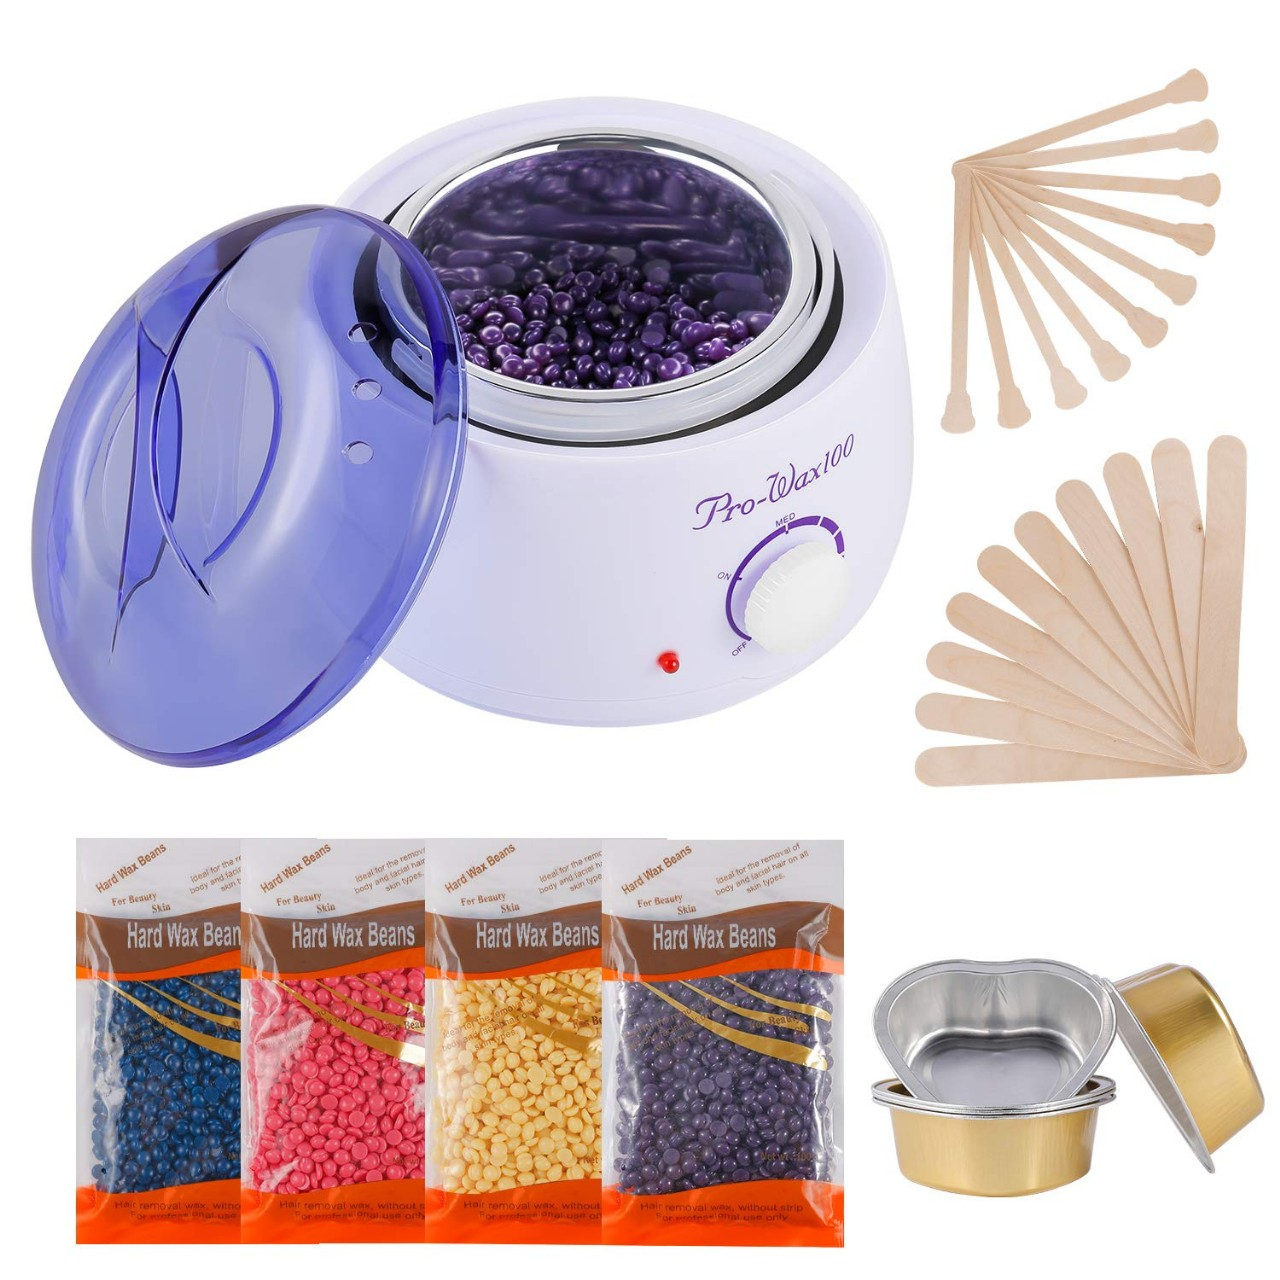 Hair Removal Waxing Kit, Wax Warmer with 4 PC Hard Wax Beans (14.1oz) 20 Wax Applicator Sticks